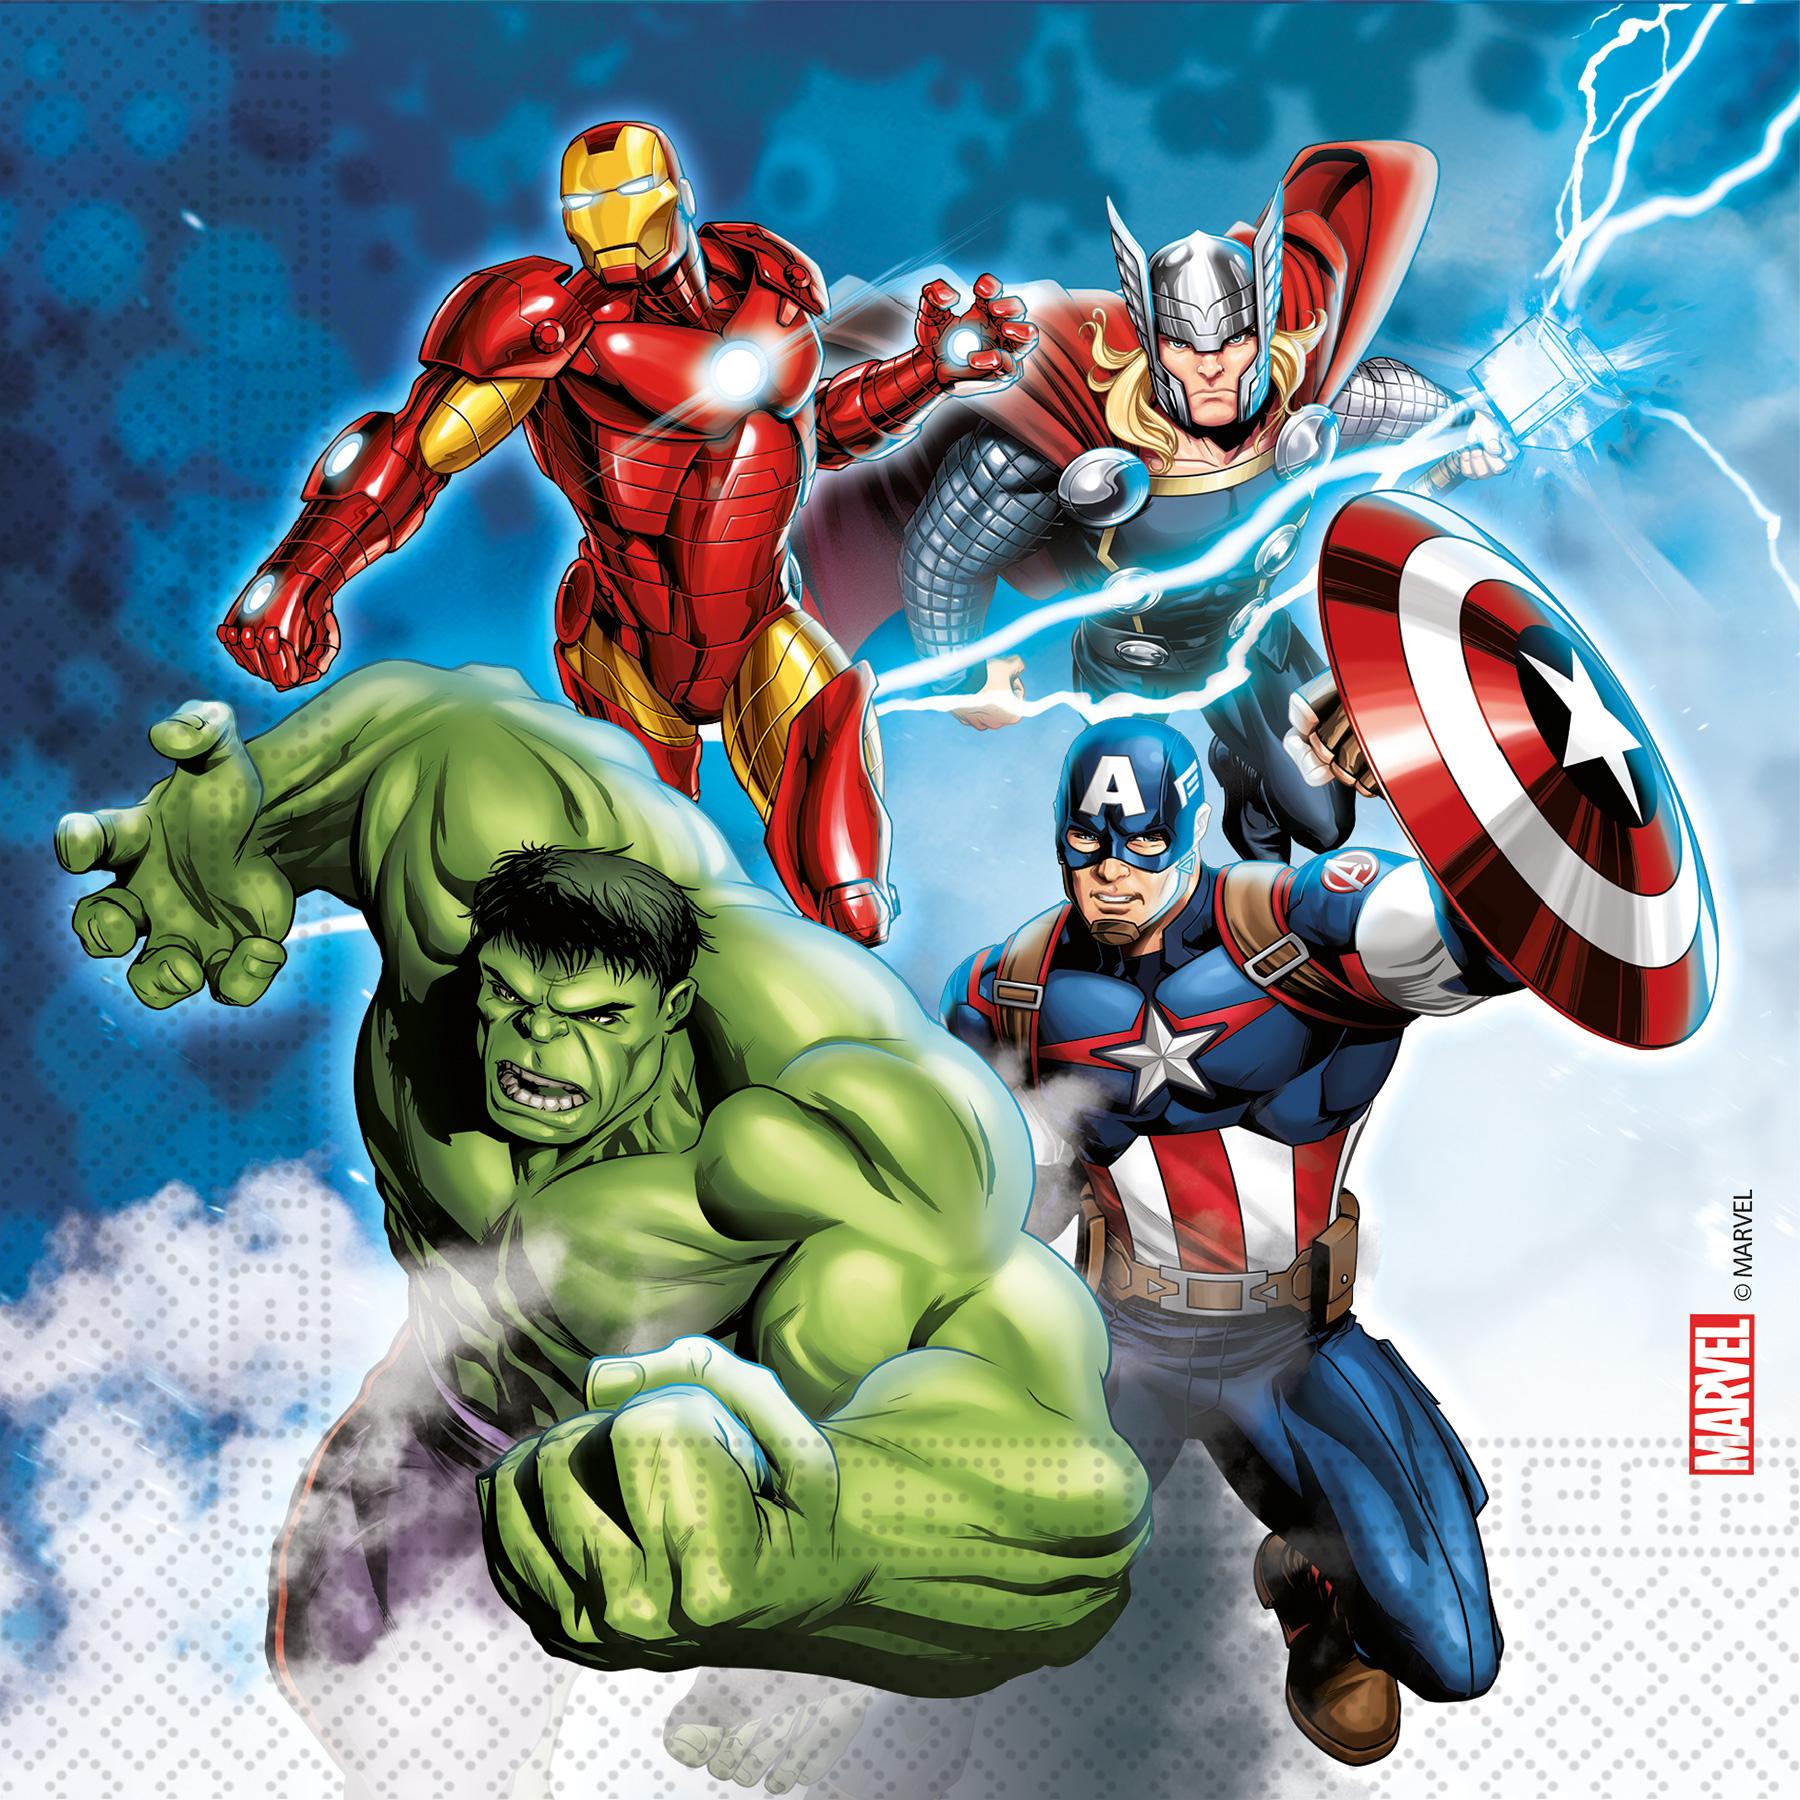 Avengers ubrousky 20 ks 33 cm x 33 cm 3-vrstvé Procos